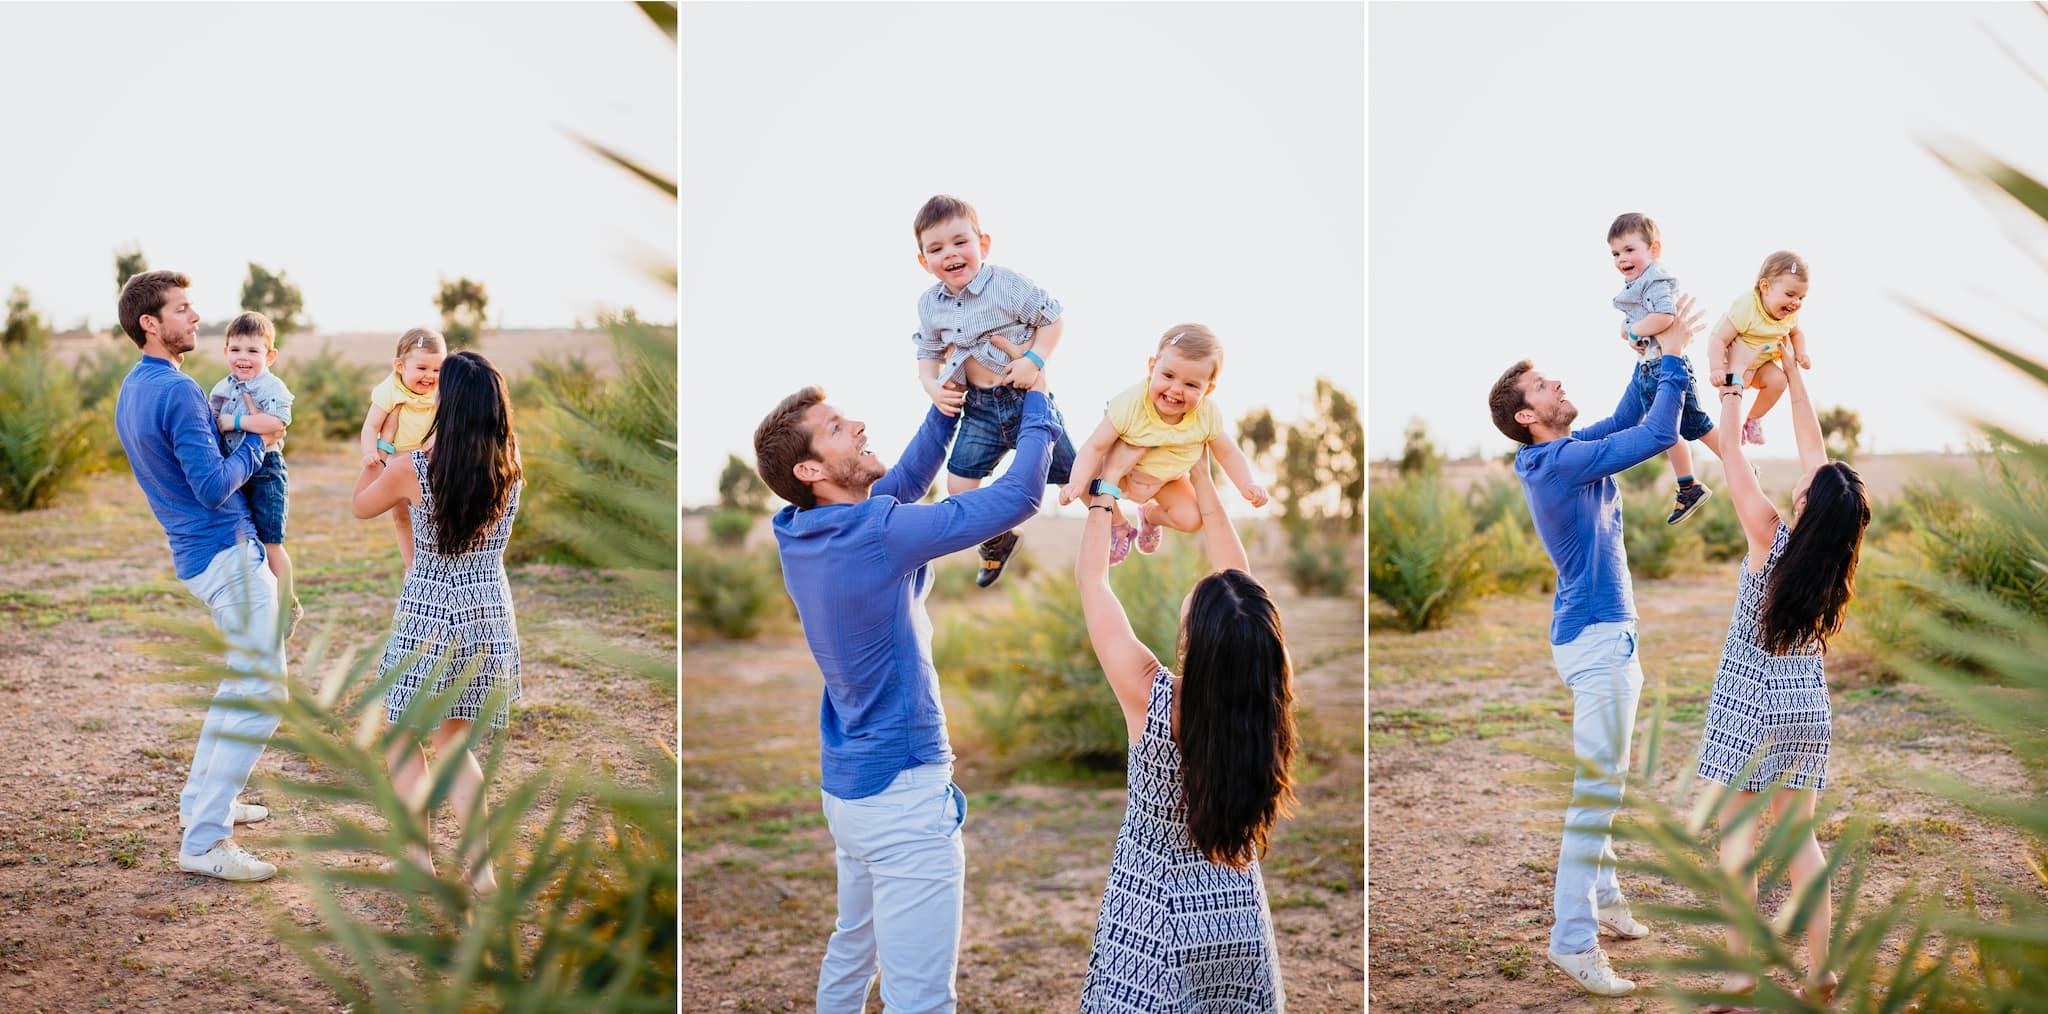 marrakesh ; maroc ; photographe ; famille